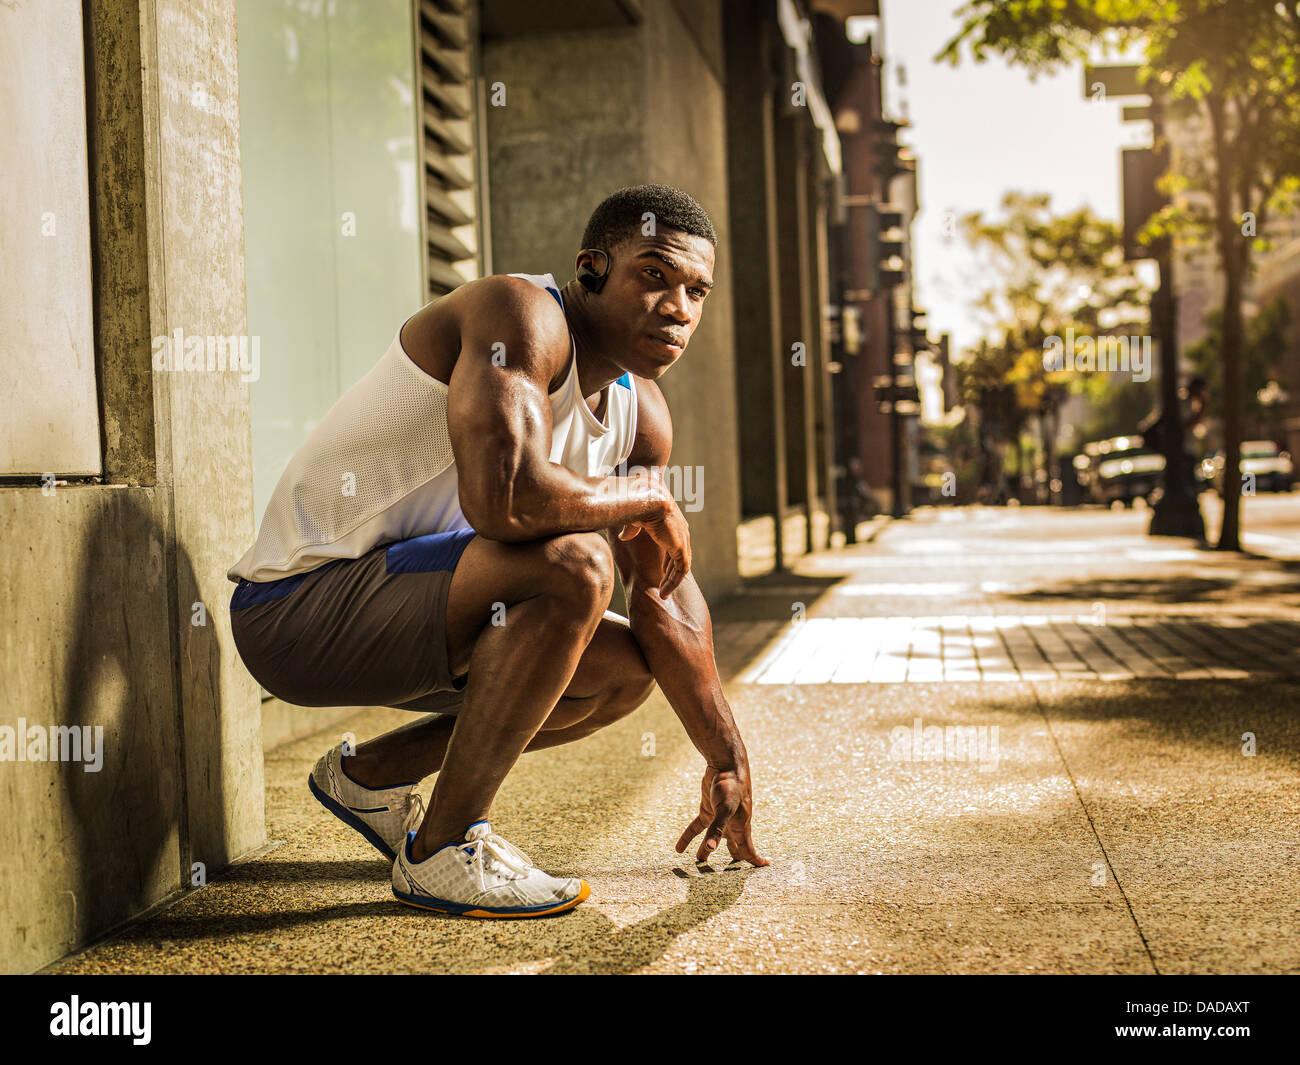 Runner crouching on street - Stock Image